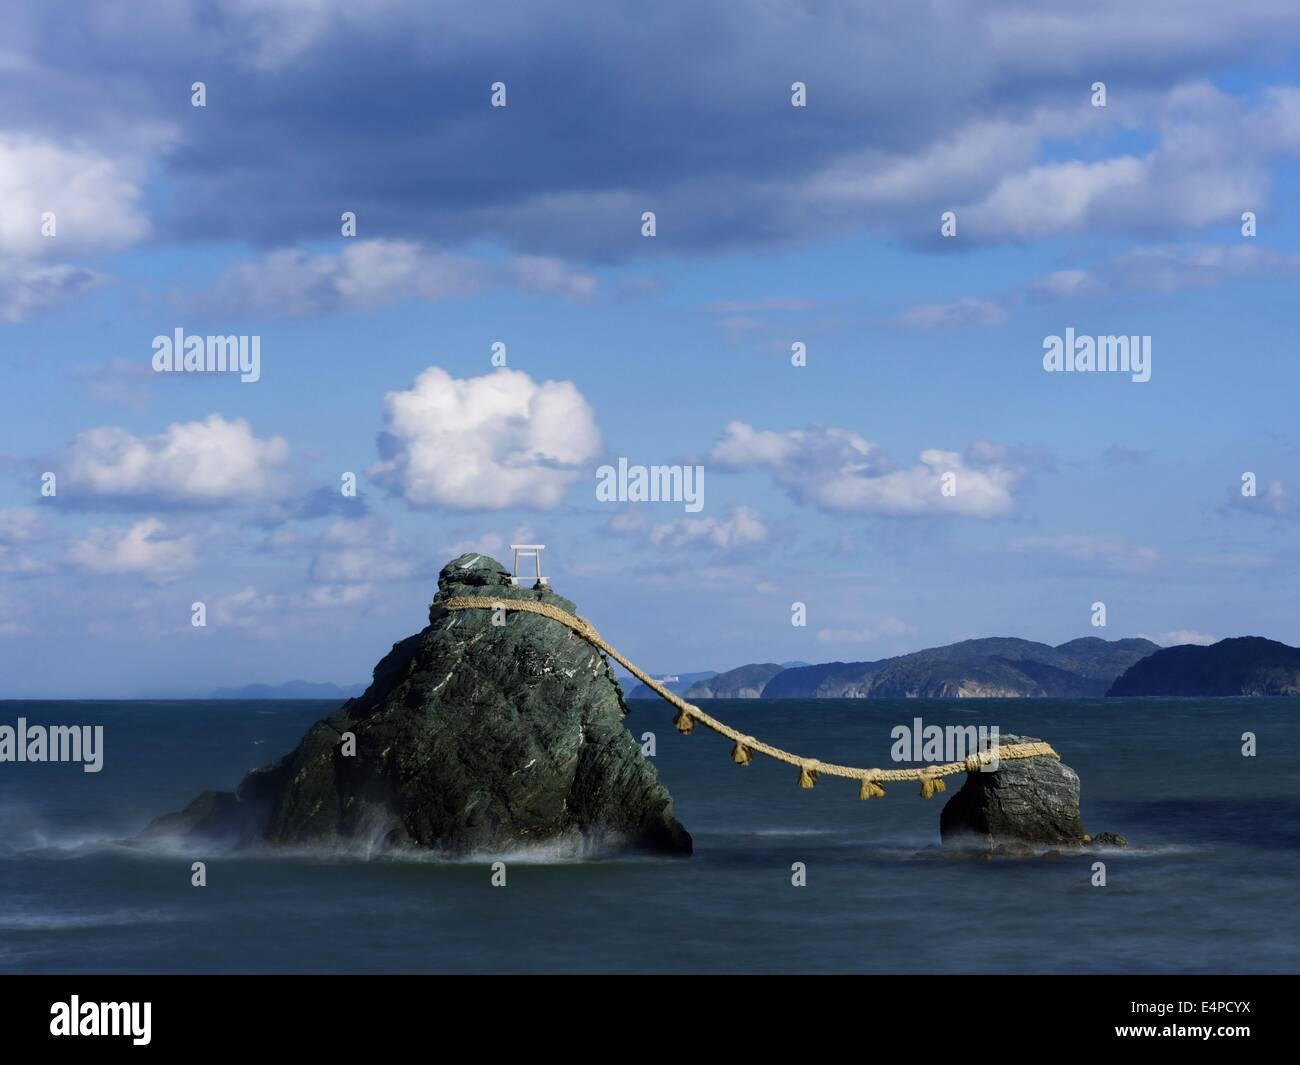 Meoto Iwa, The Married Rocks in Futami, Mie, Japan - Stock Image